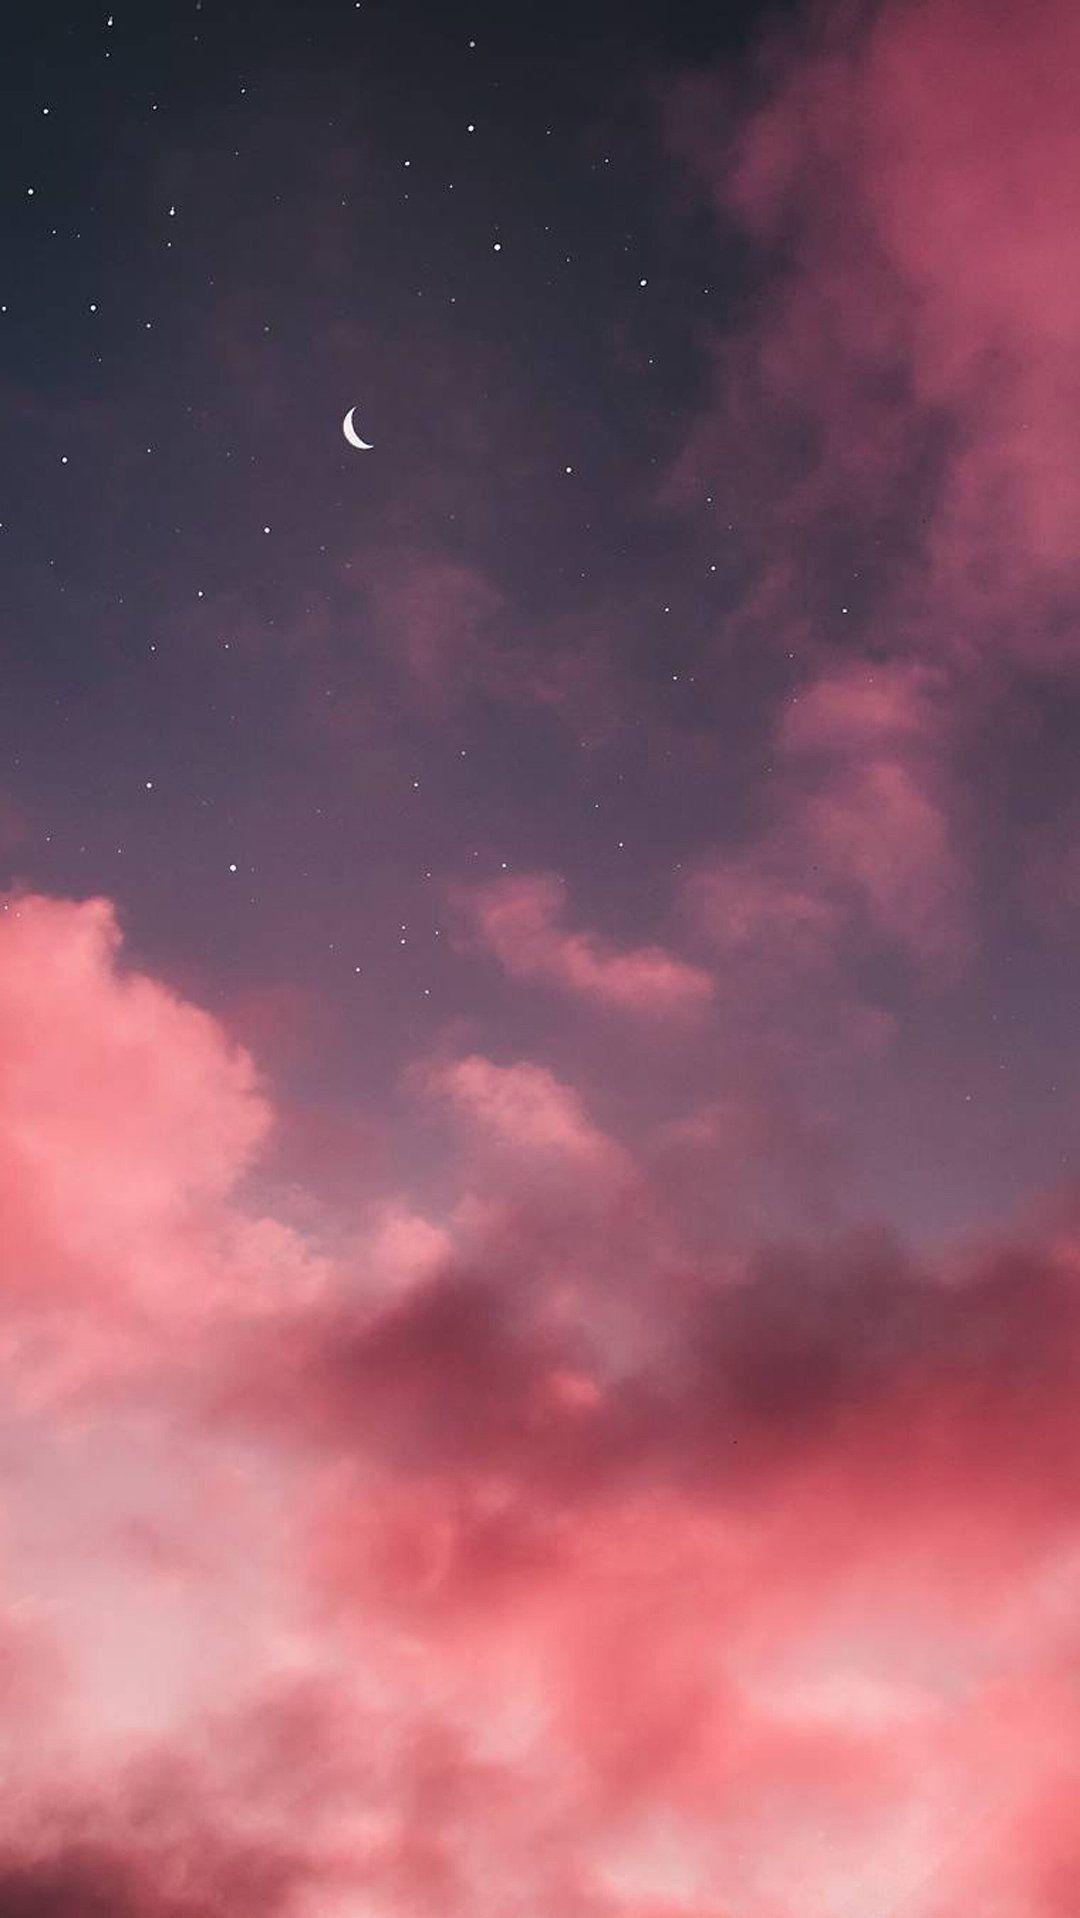 Phone Wallpaper Stars Stars Stars Sky 6wallpaper Wallpaprs Background Iphone Iphone11 Iphone Wallpaper Moon Iphone Wallpaper Stars Pink Clouds Wallpaper